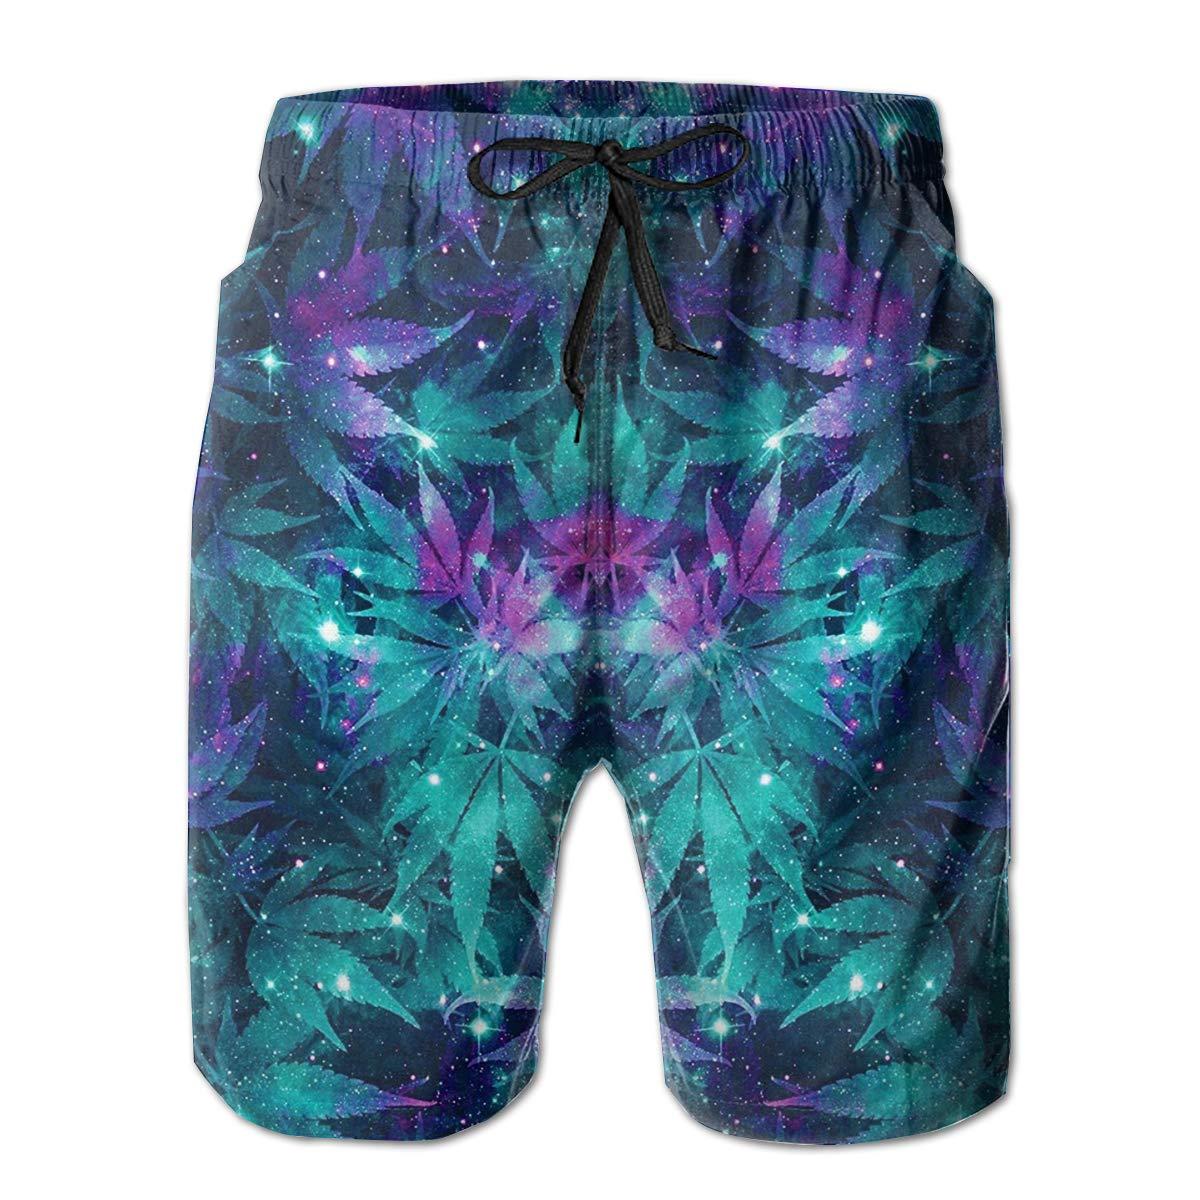 Mens Swim Trunks Galaxy Beach Board Shorts Quick Dry Sports Running Swim Board Shorts with Pockets Mesh Lining